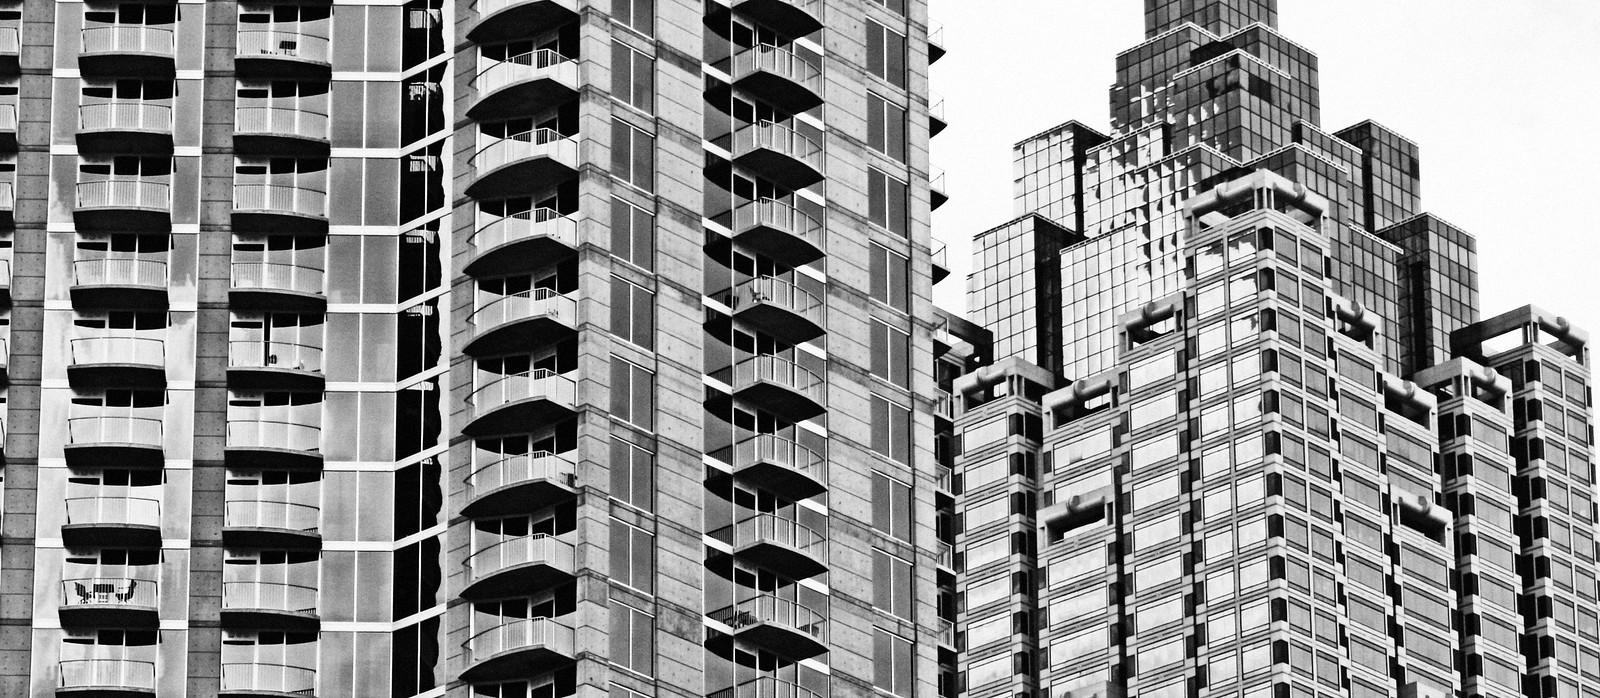 12 Centennial Park Hotel, Balconies in June, Atlanta, 2013